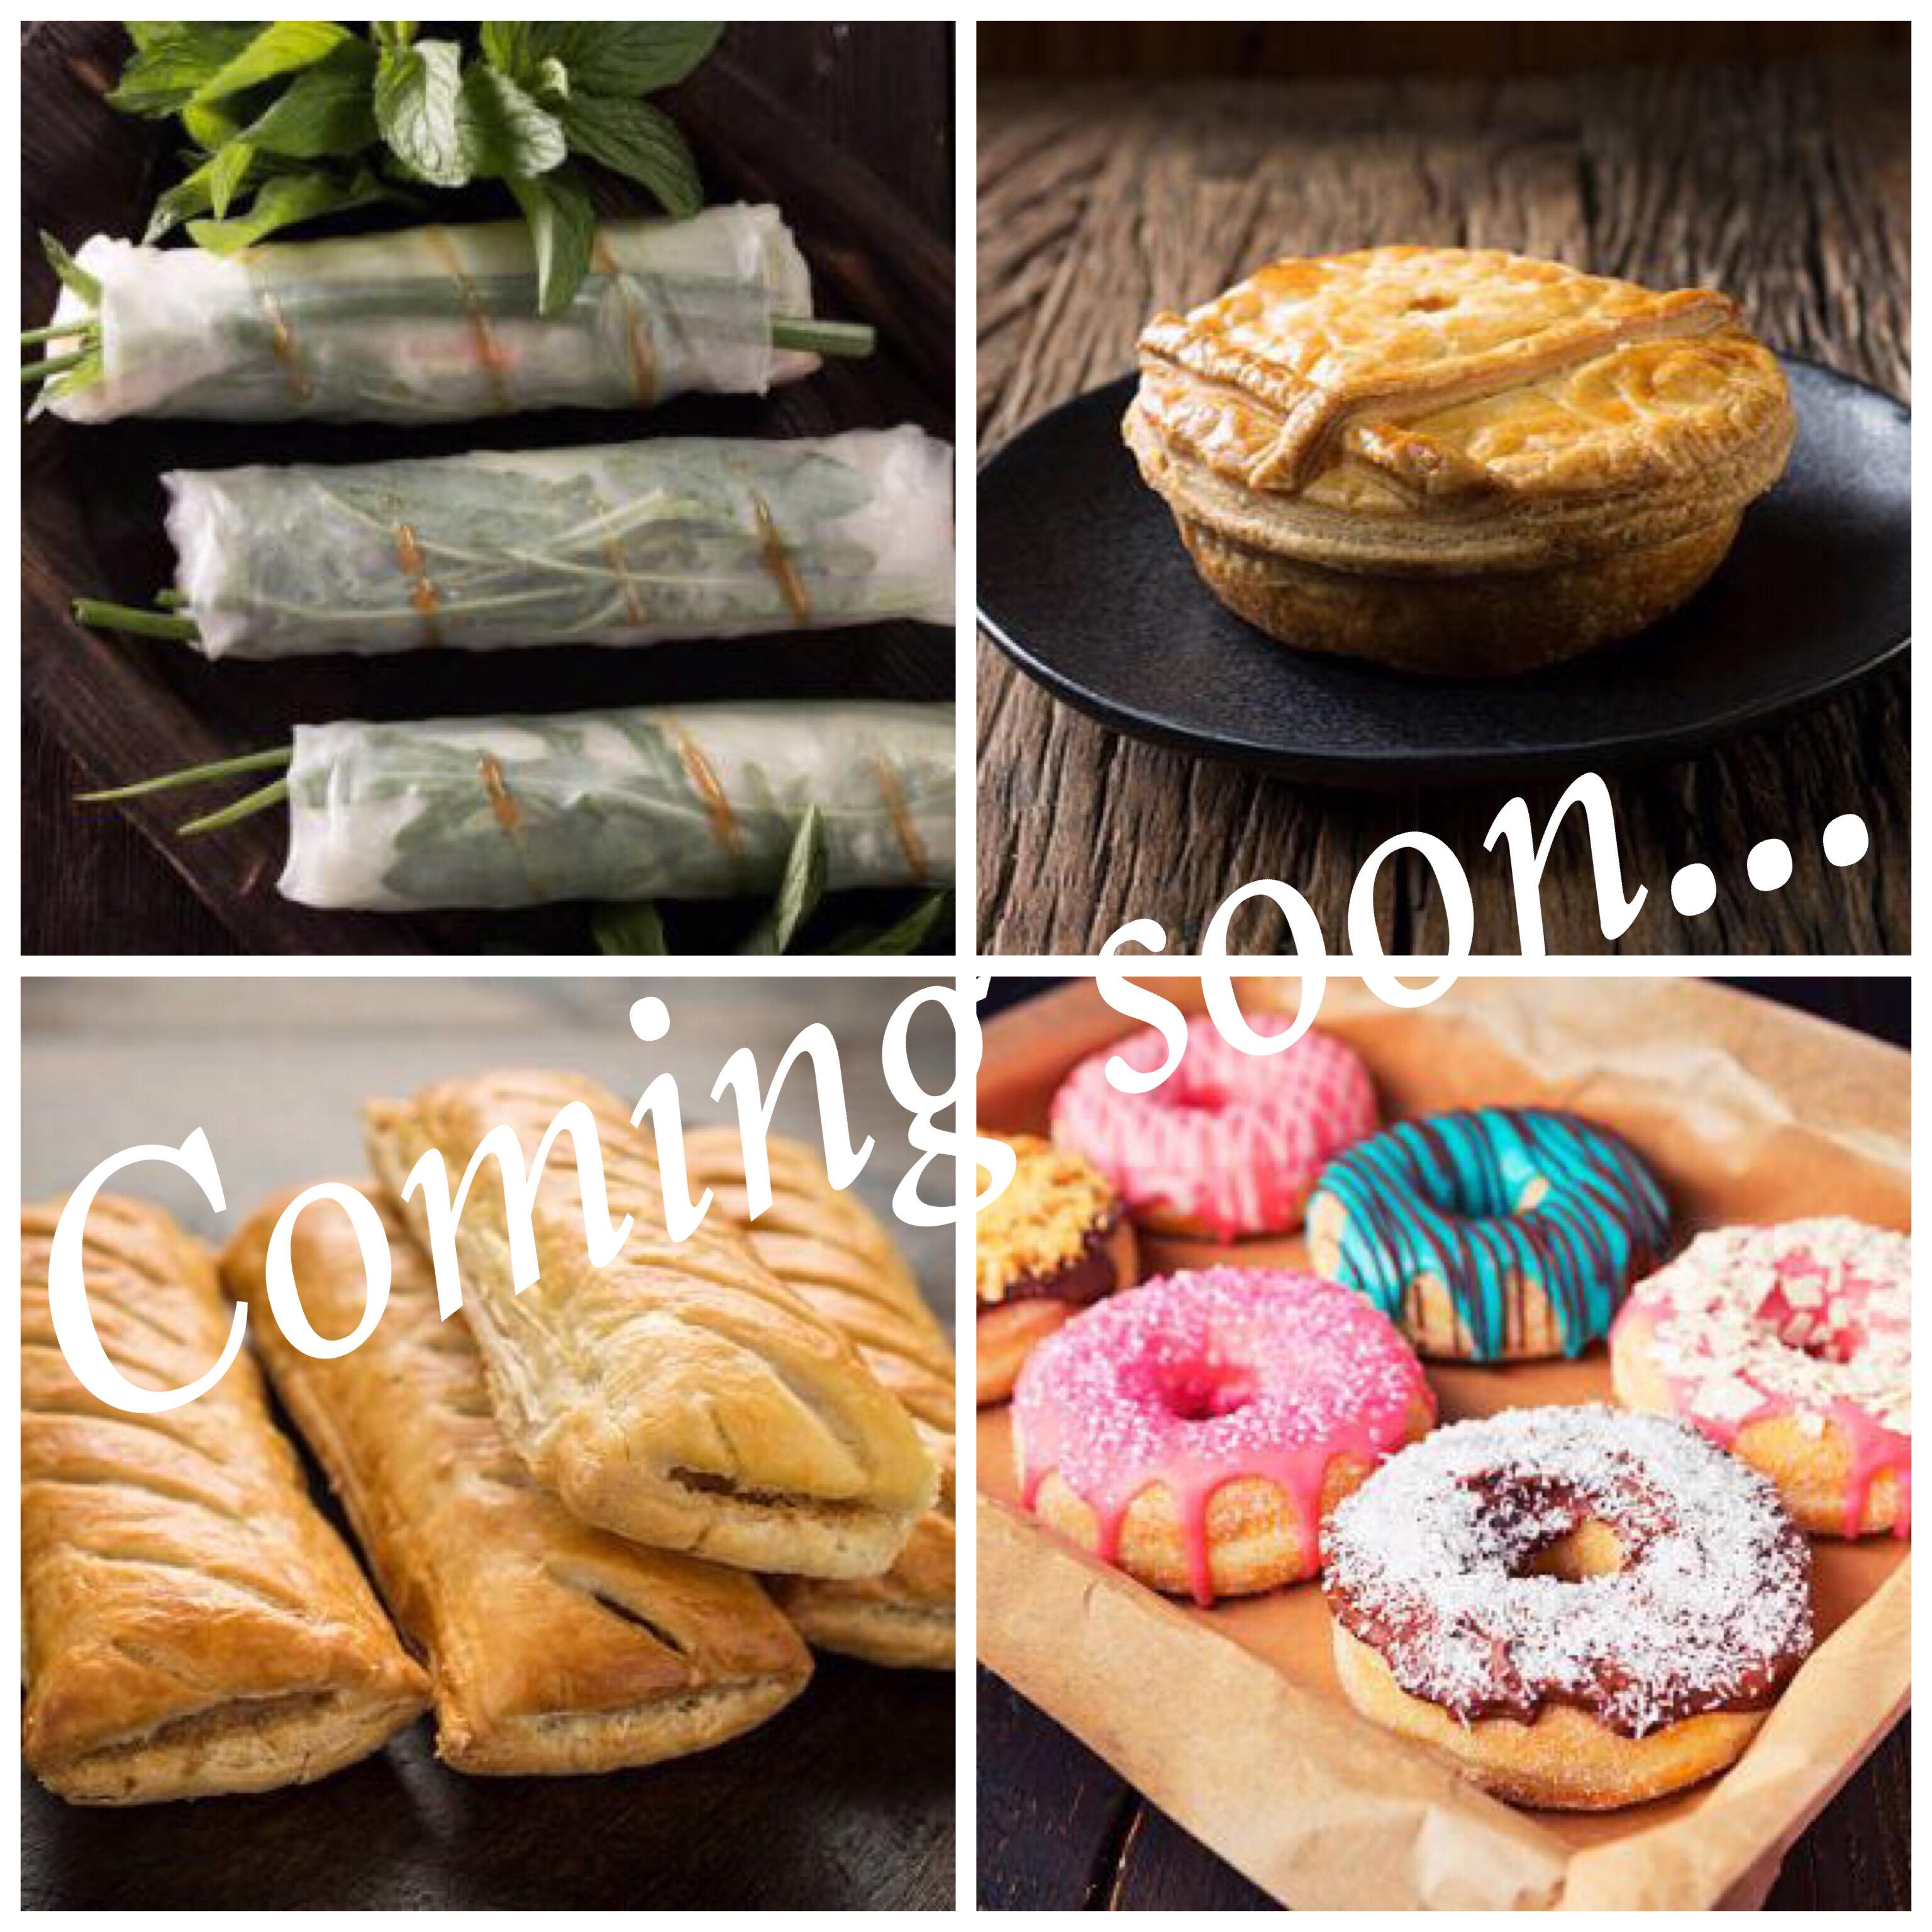 Bakery coming soon